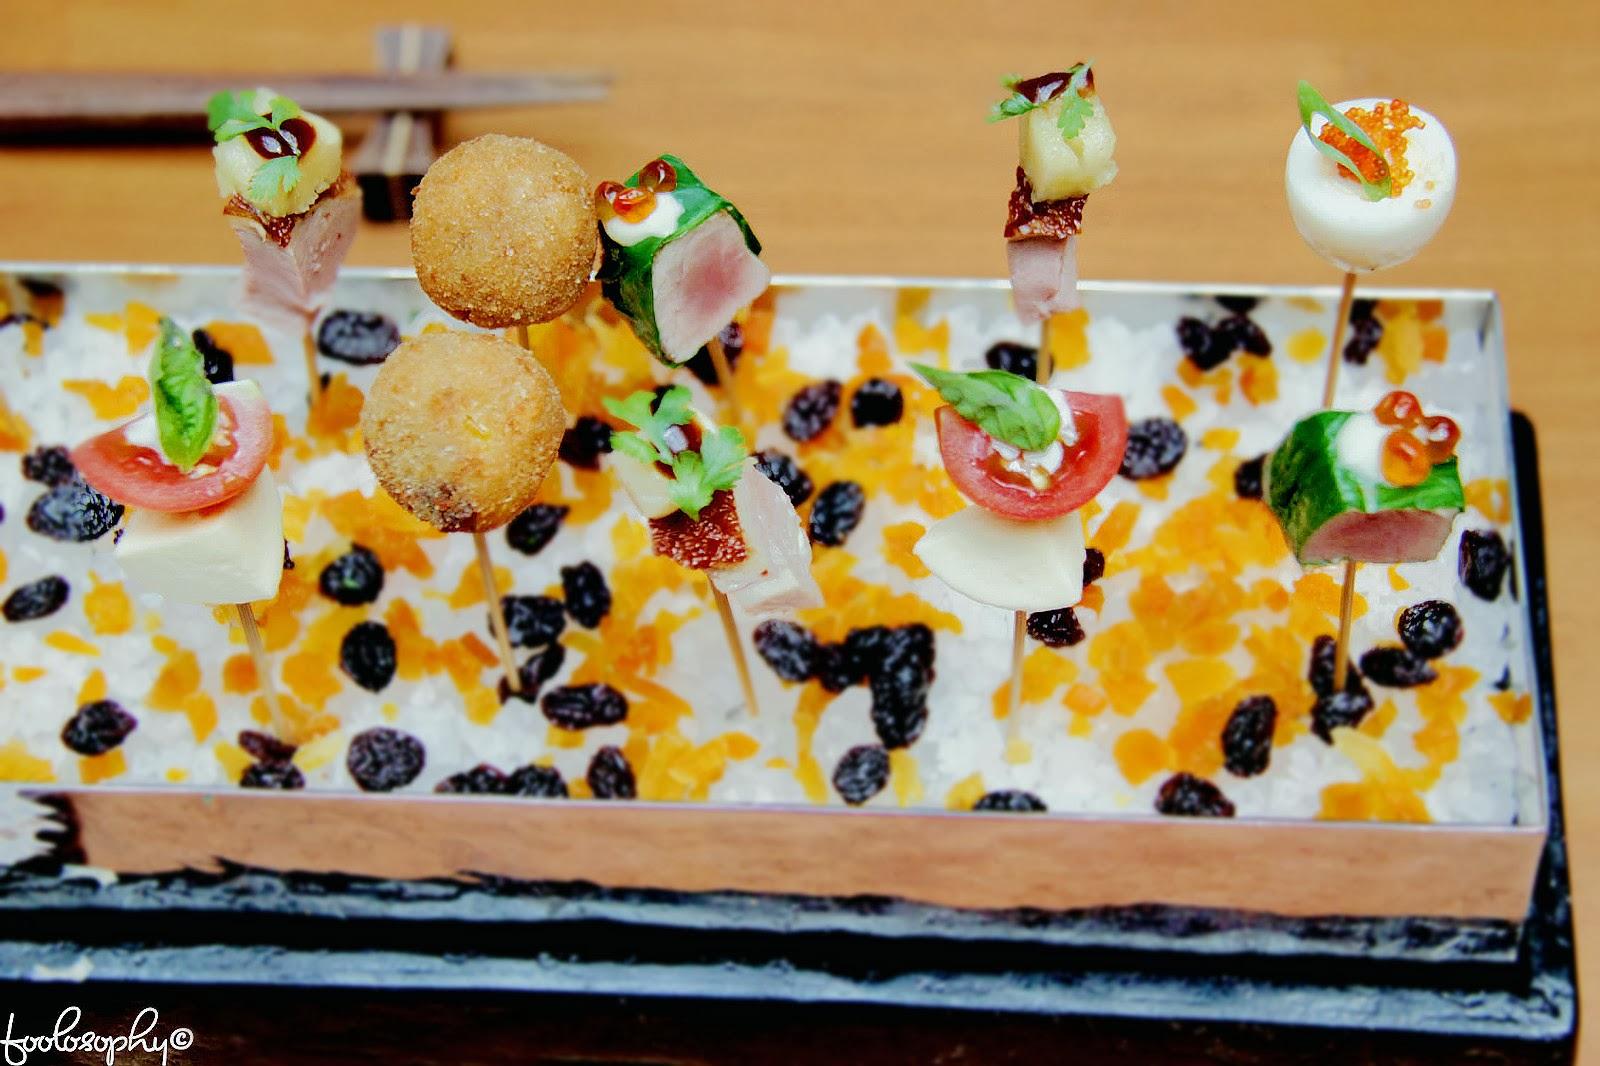 Steak & Seafood Restaurant Jakarta : Asian Wok Promotion - F O O L ...